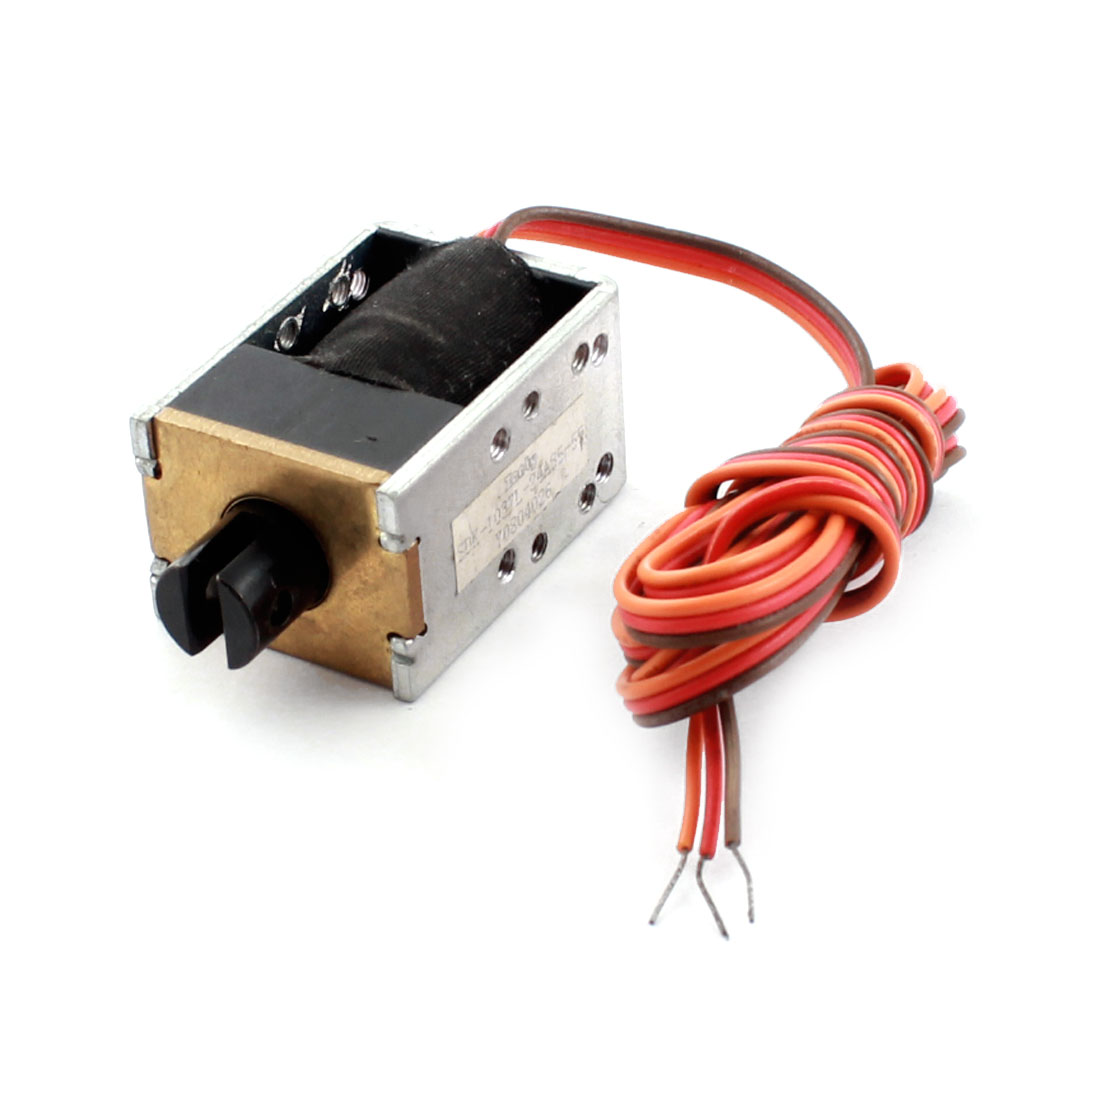 Spare Parts DC 24V 500g/10mm Pull Electric Magnet Solenoid Electromagnet